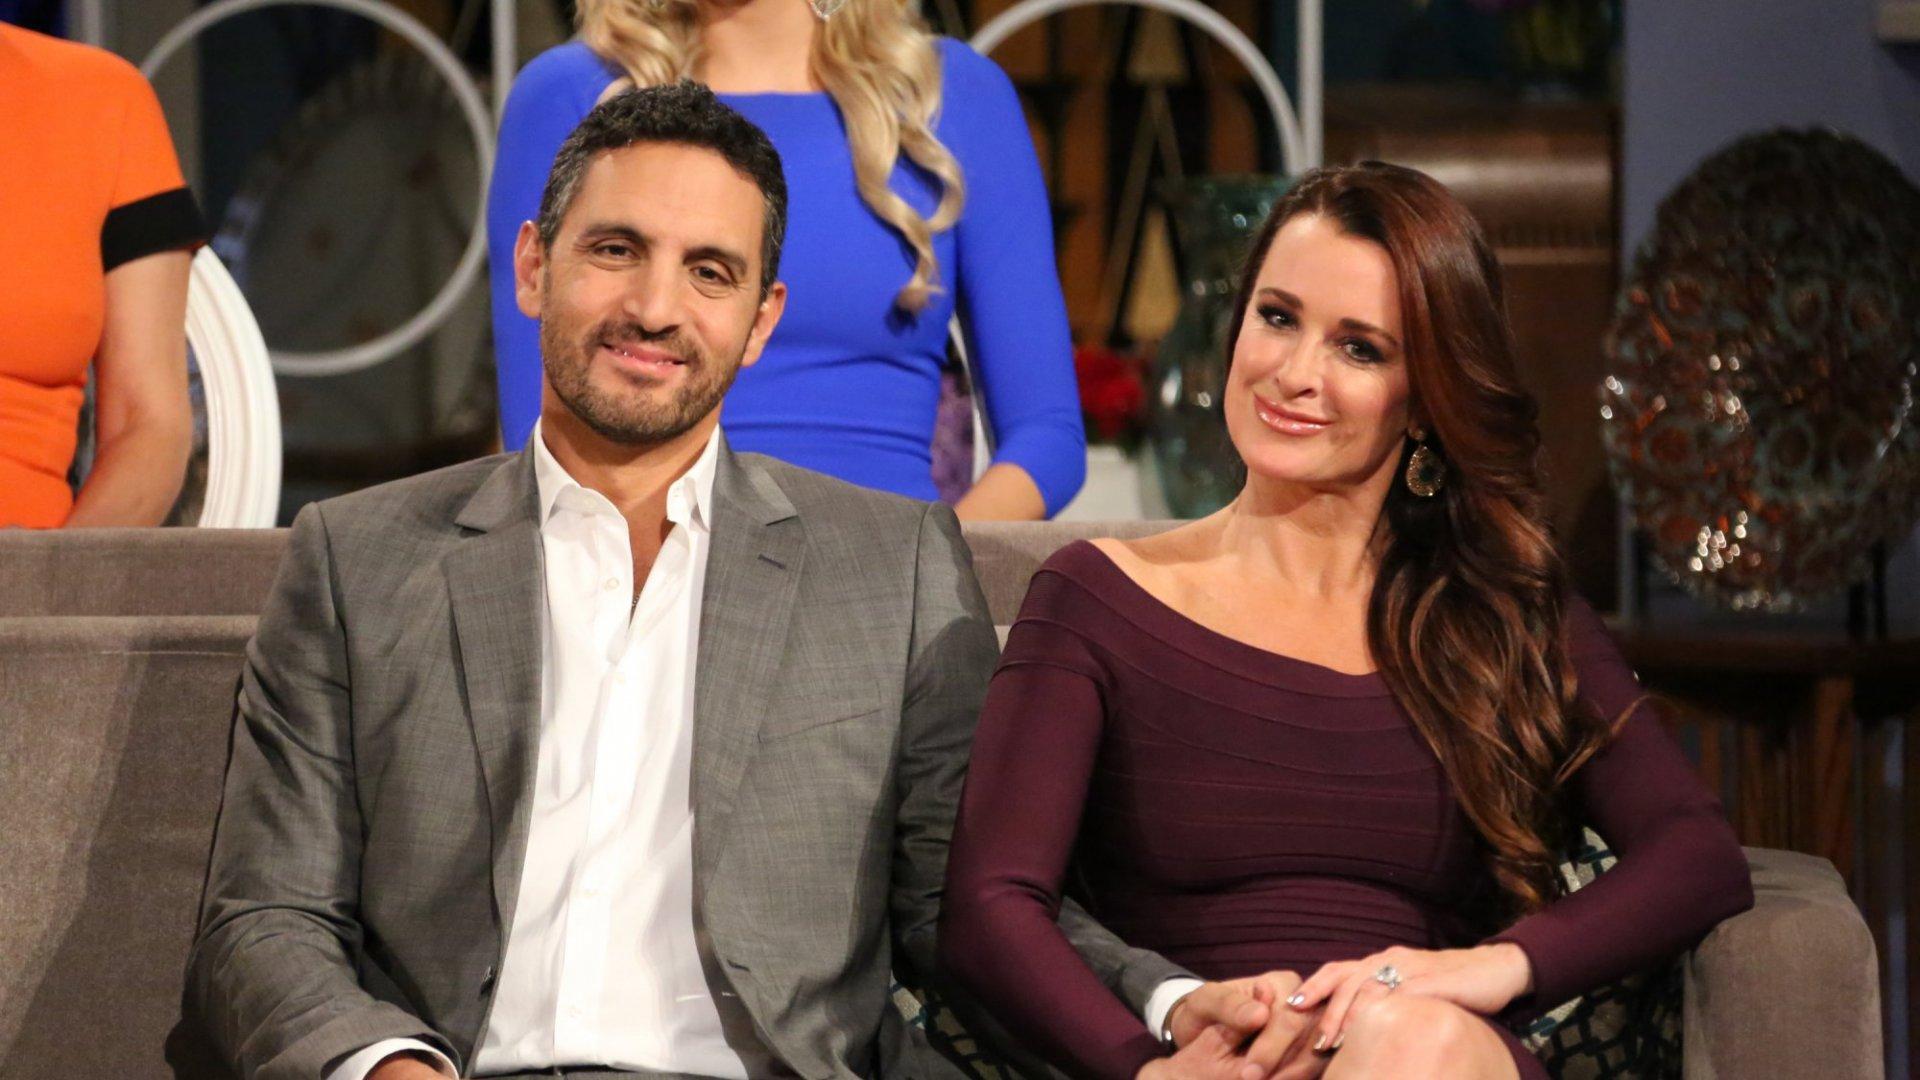 Mauricio Umansky and his wife, Kyle Richards.